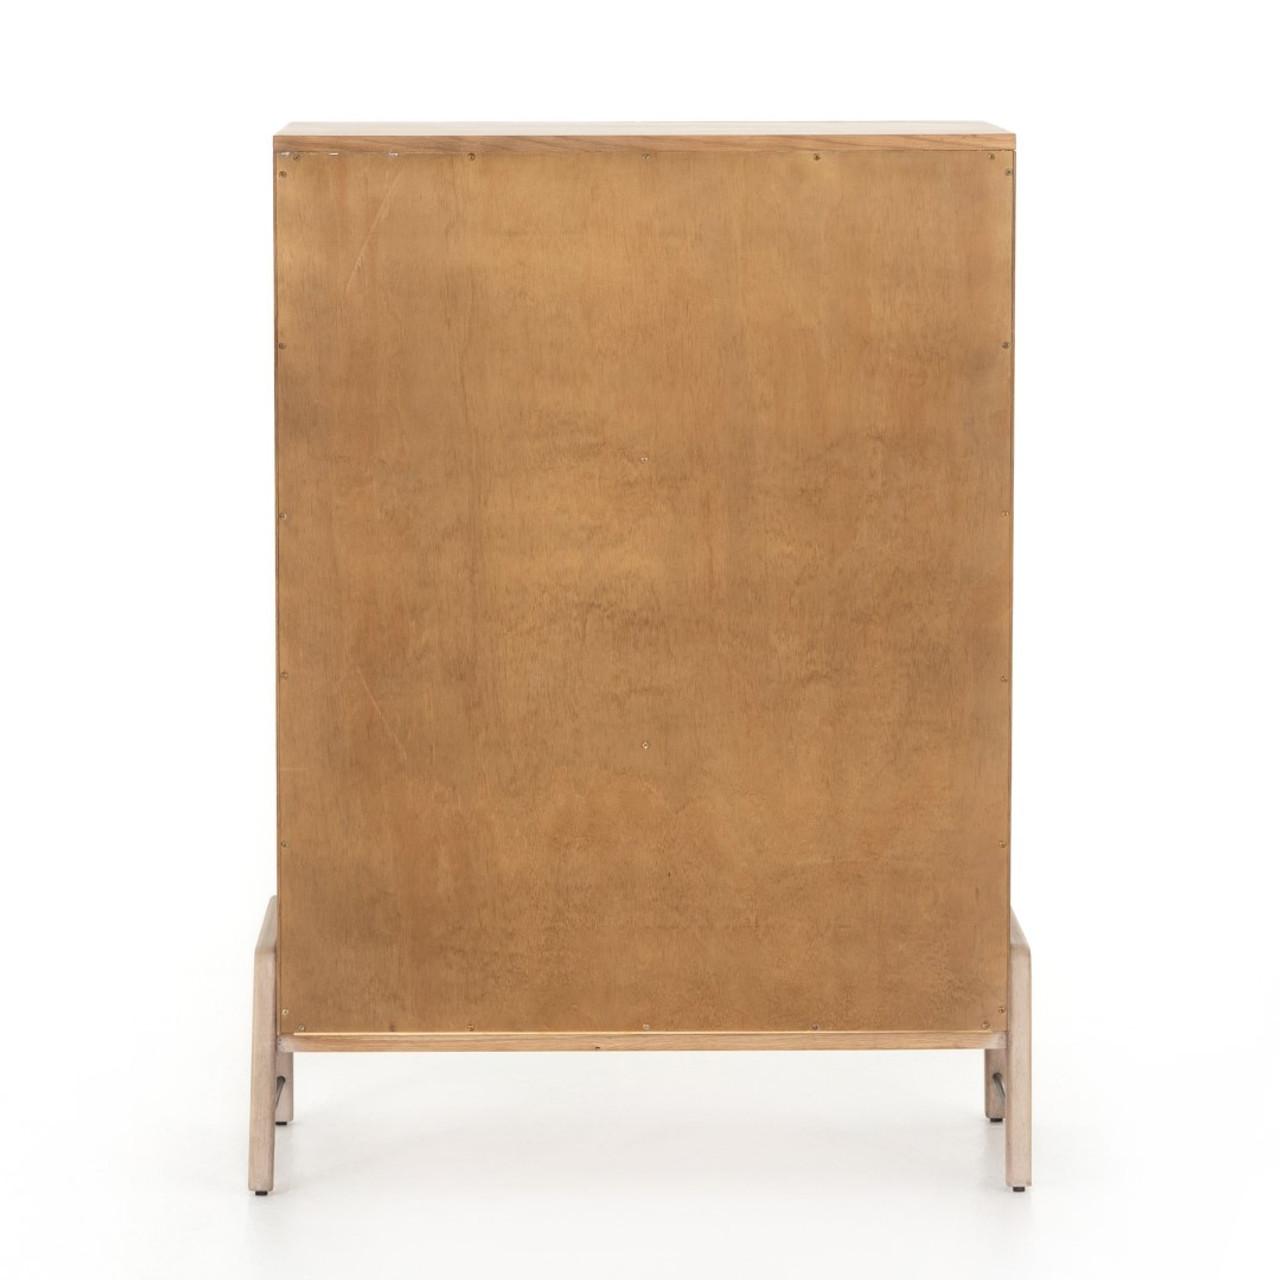 Ruse 6 Drawer Tall Dresser - Yucca Oak